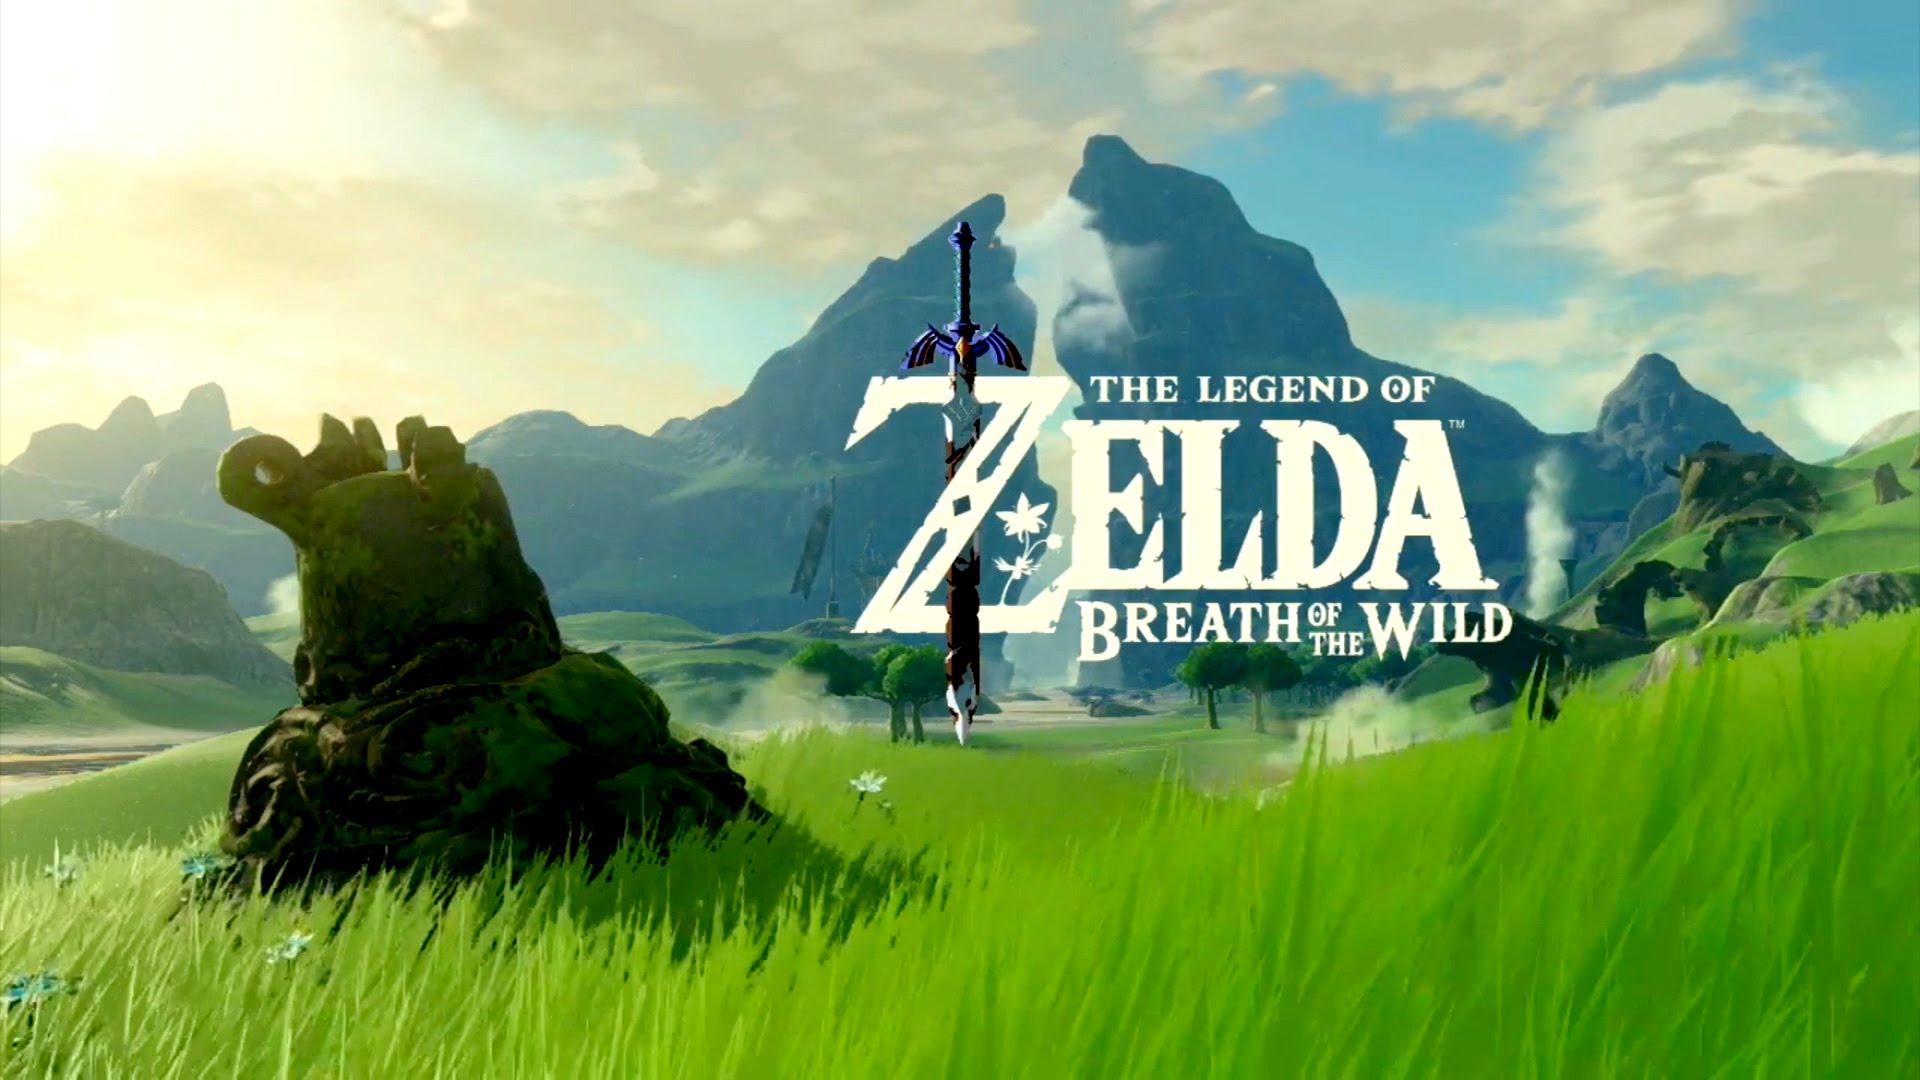 Free Download The Legend Of Zelda Breath Of The Wild Masa Szczegw